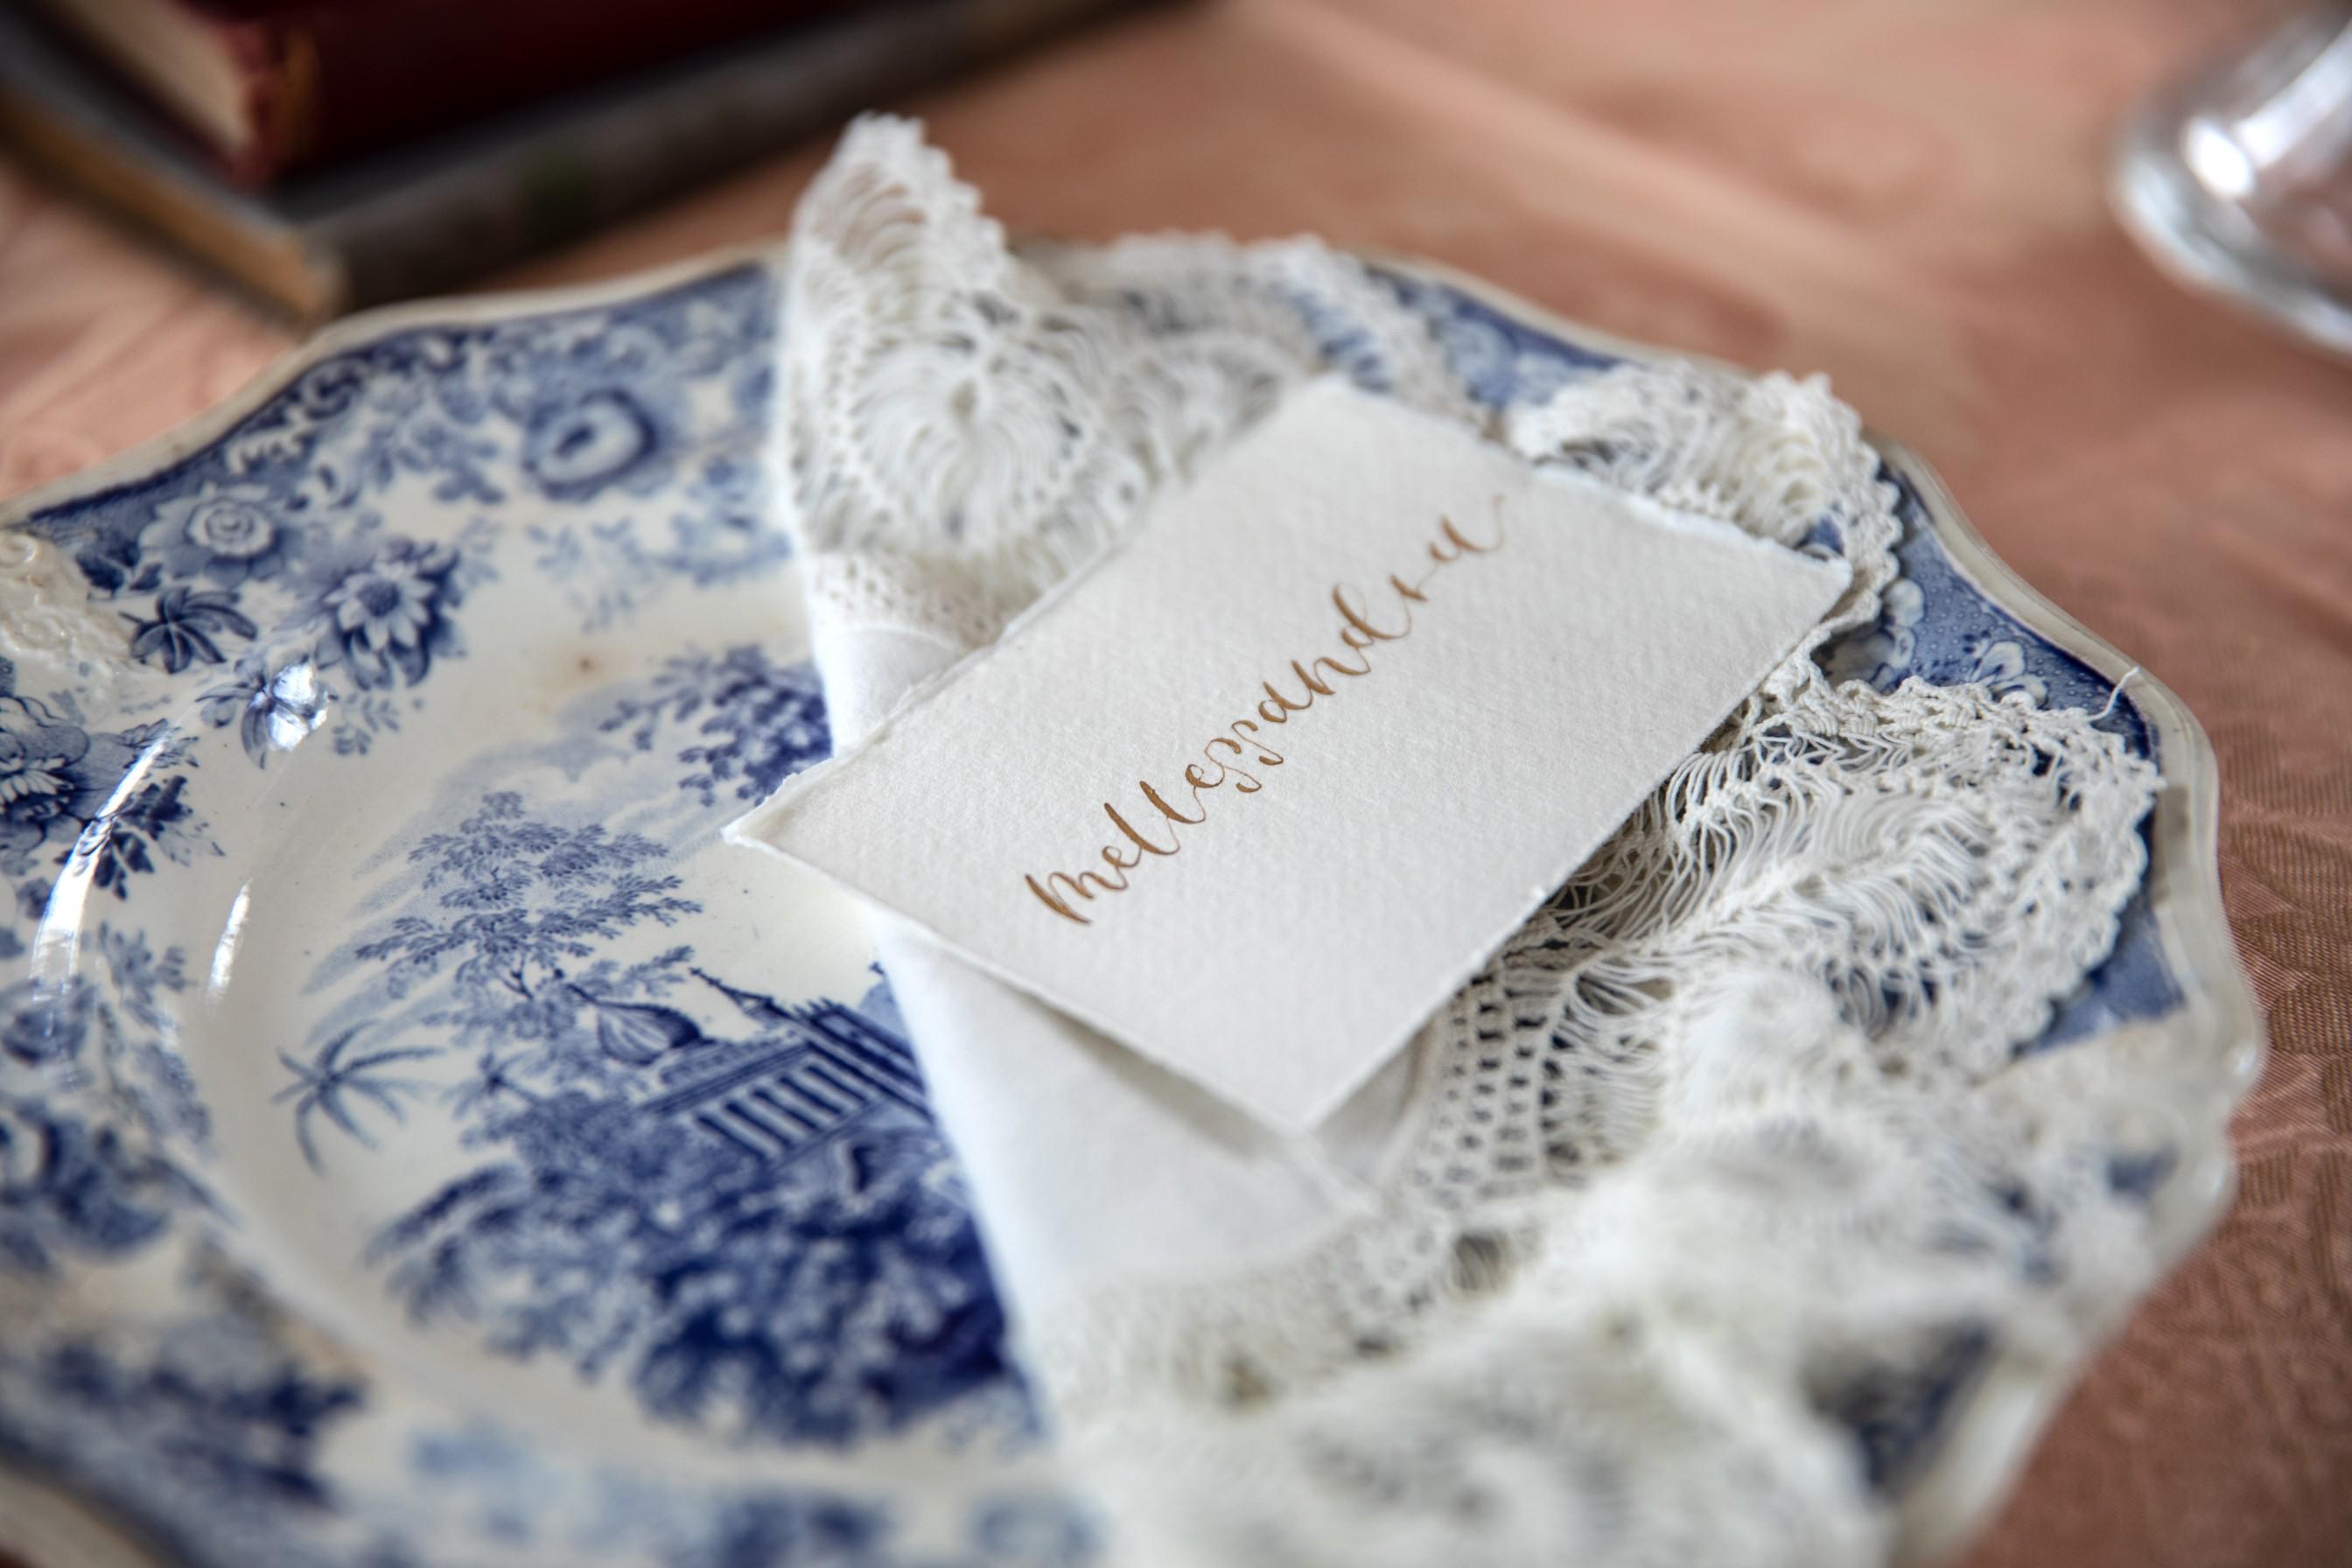 vintage wedding stationery - wedding calligraphy - vintage wedding place name